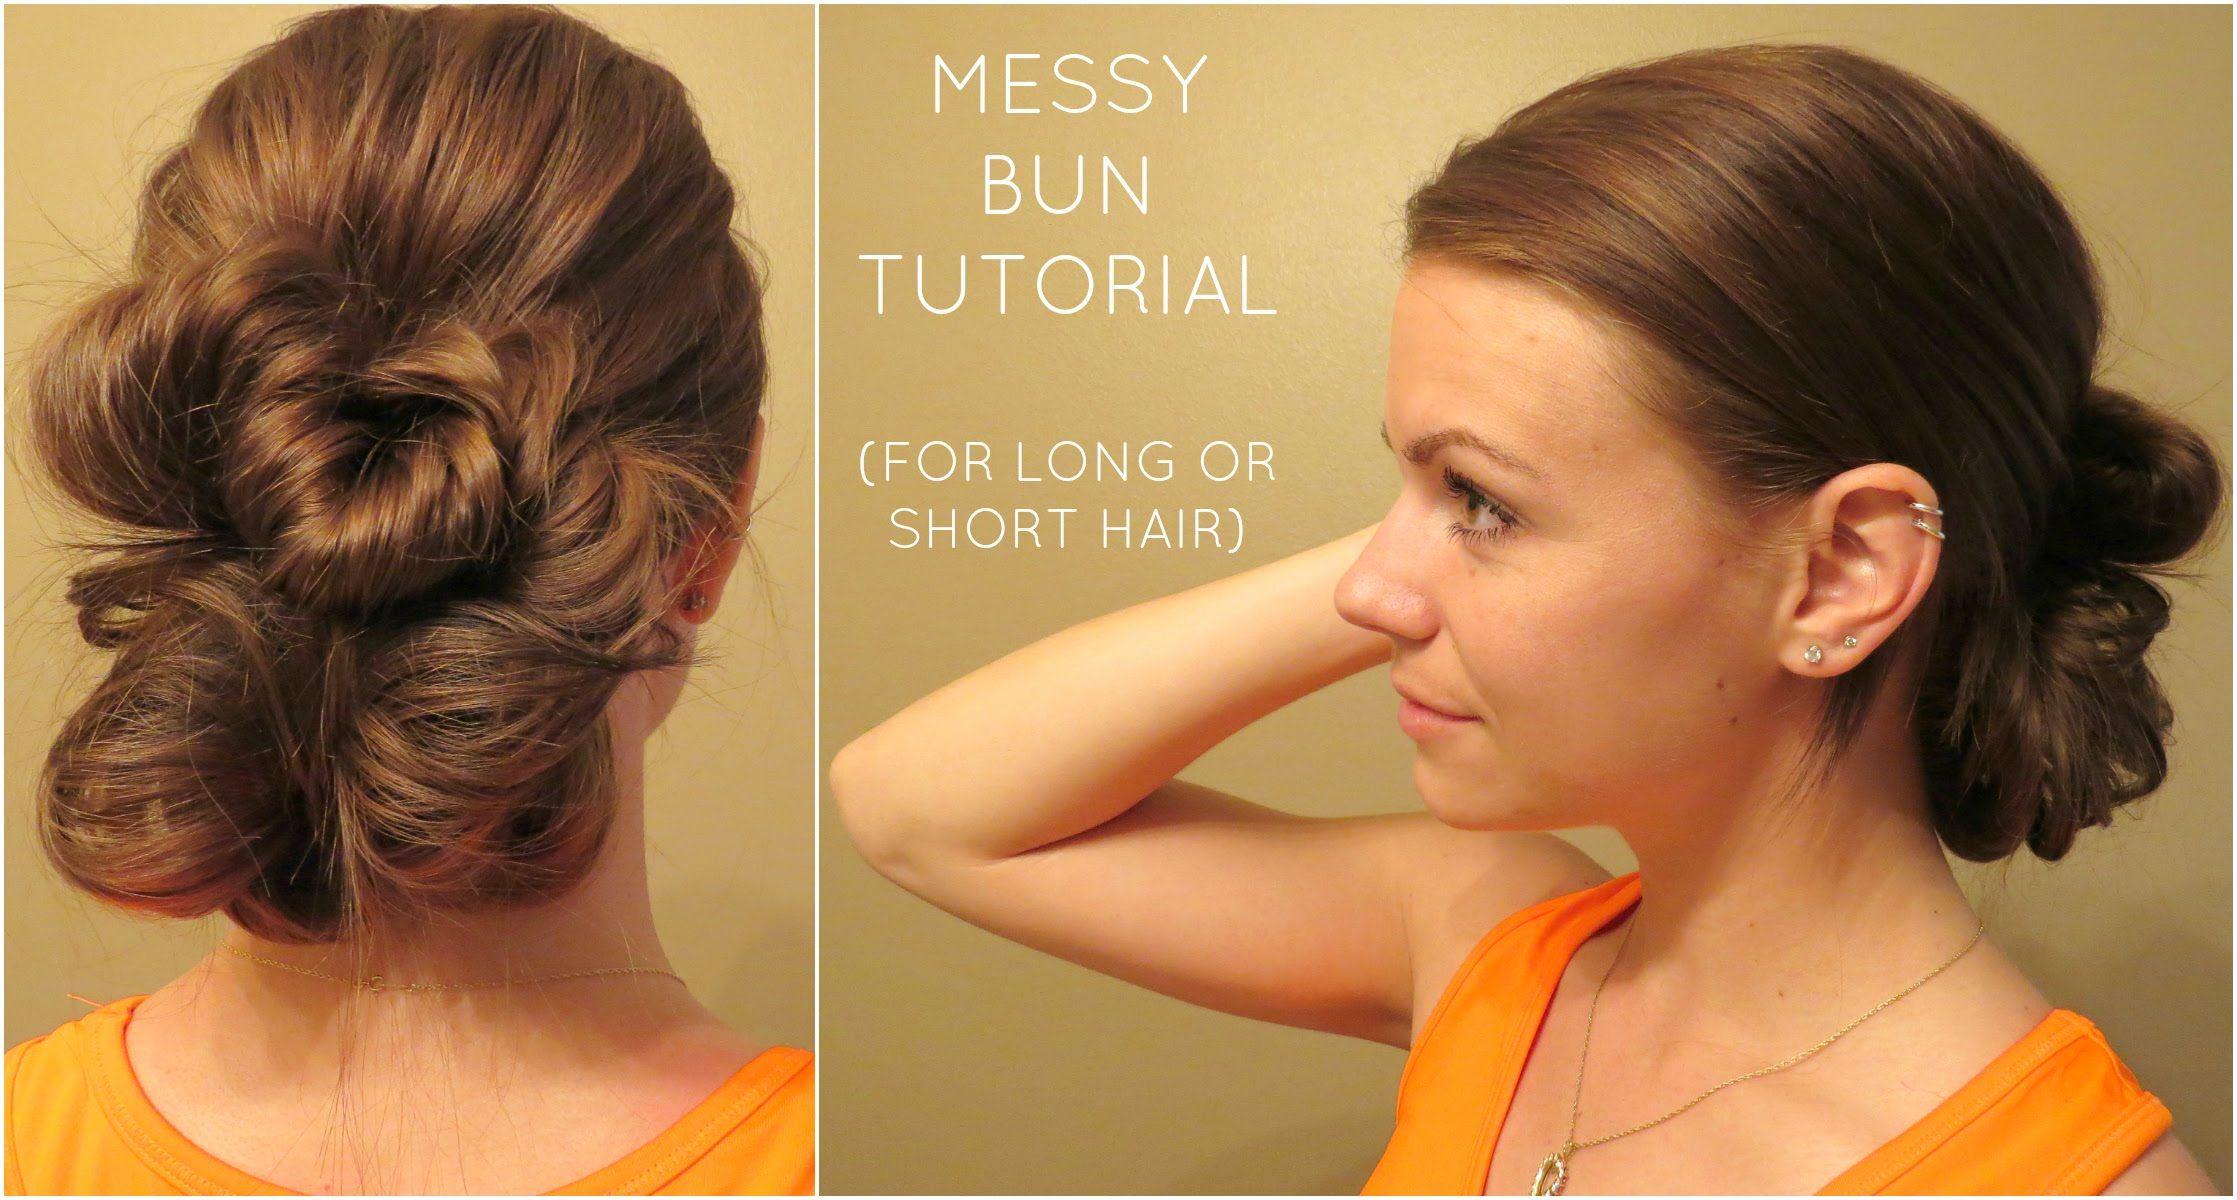 Messy Bun Tutorial for Long or Short Hair